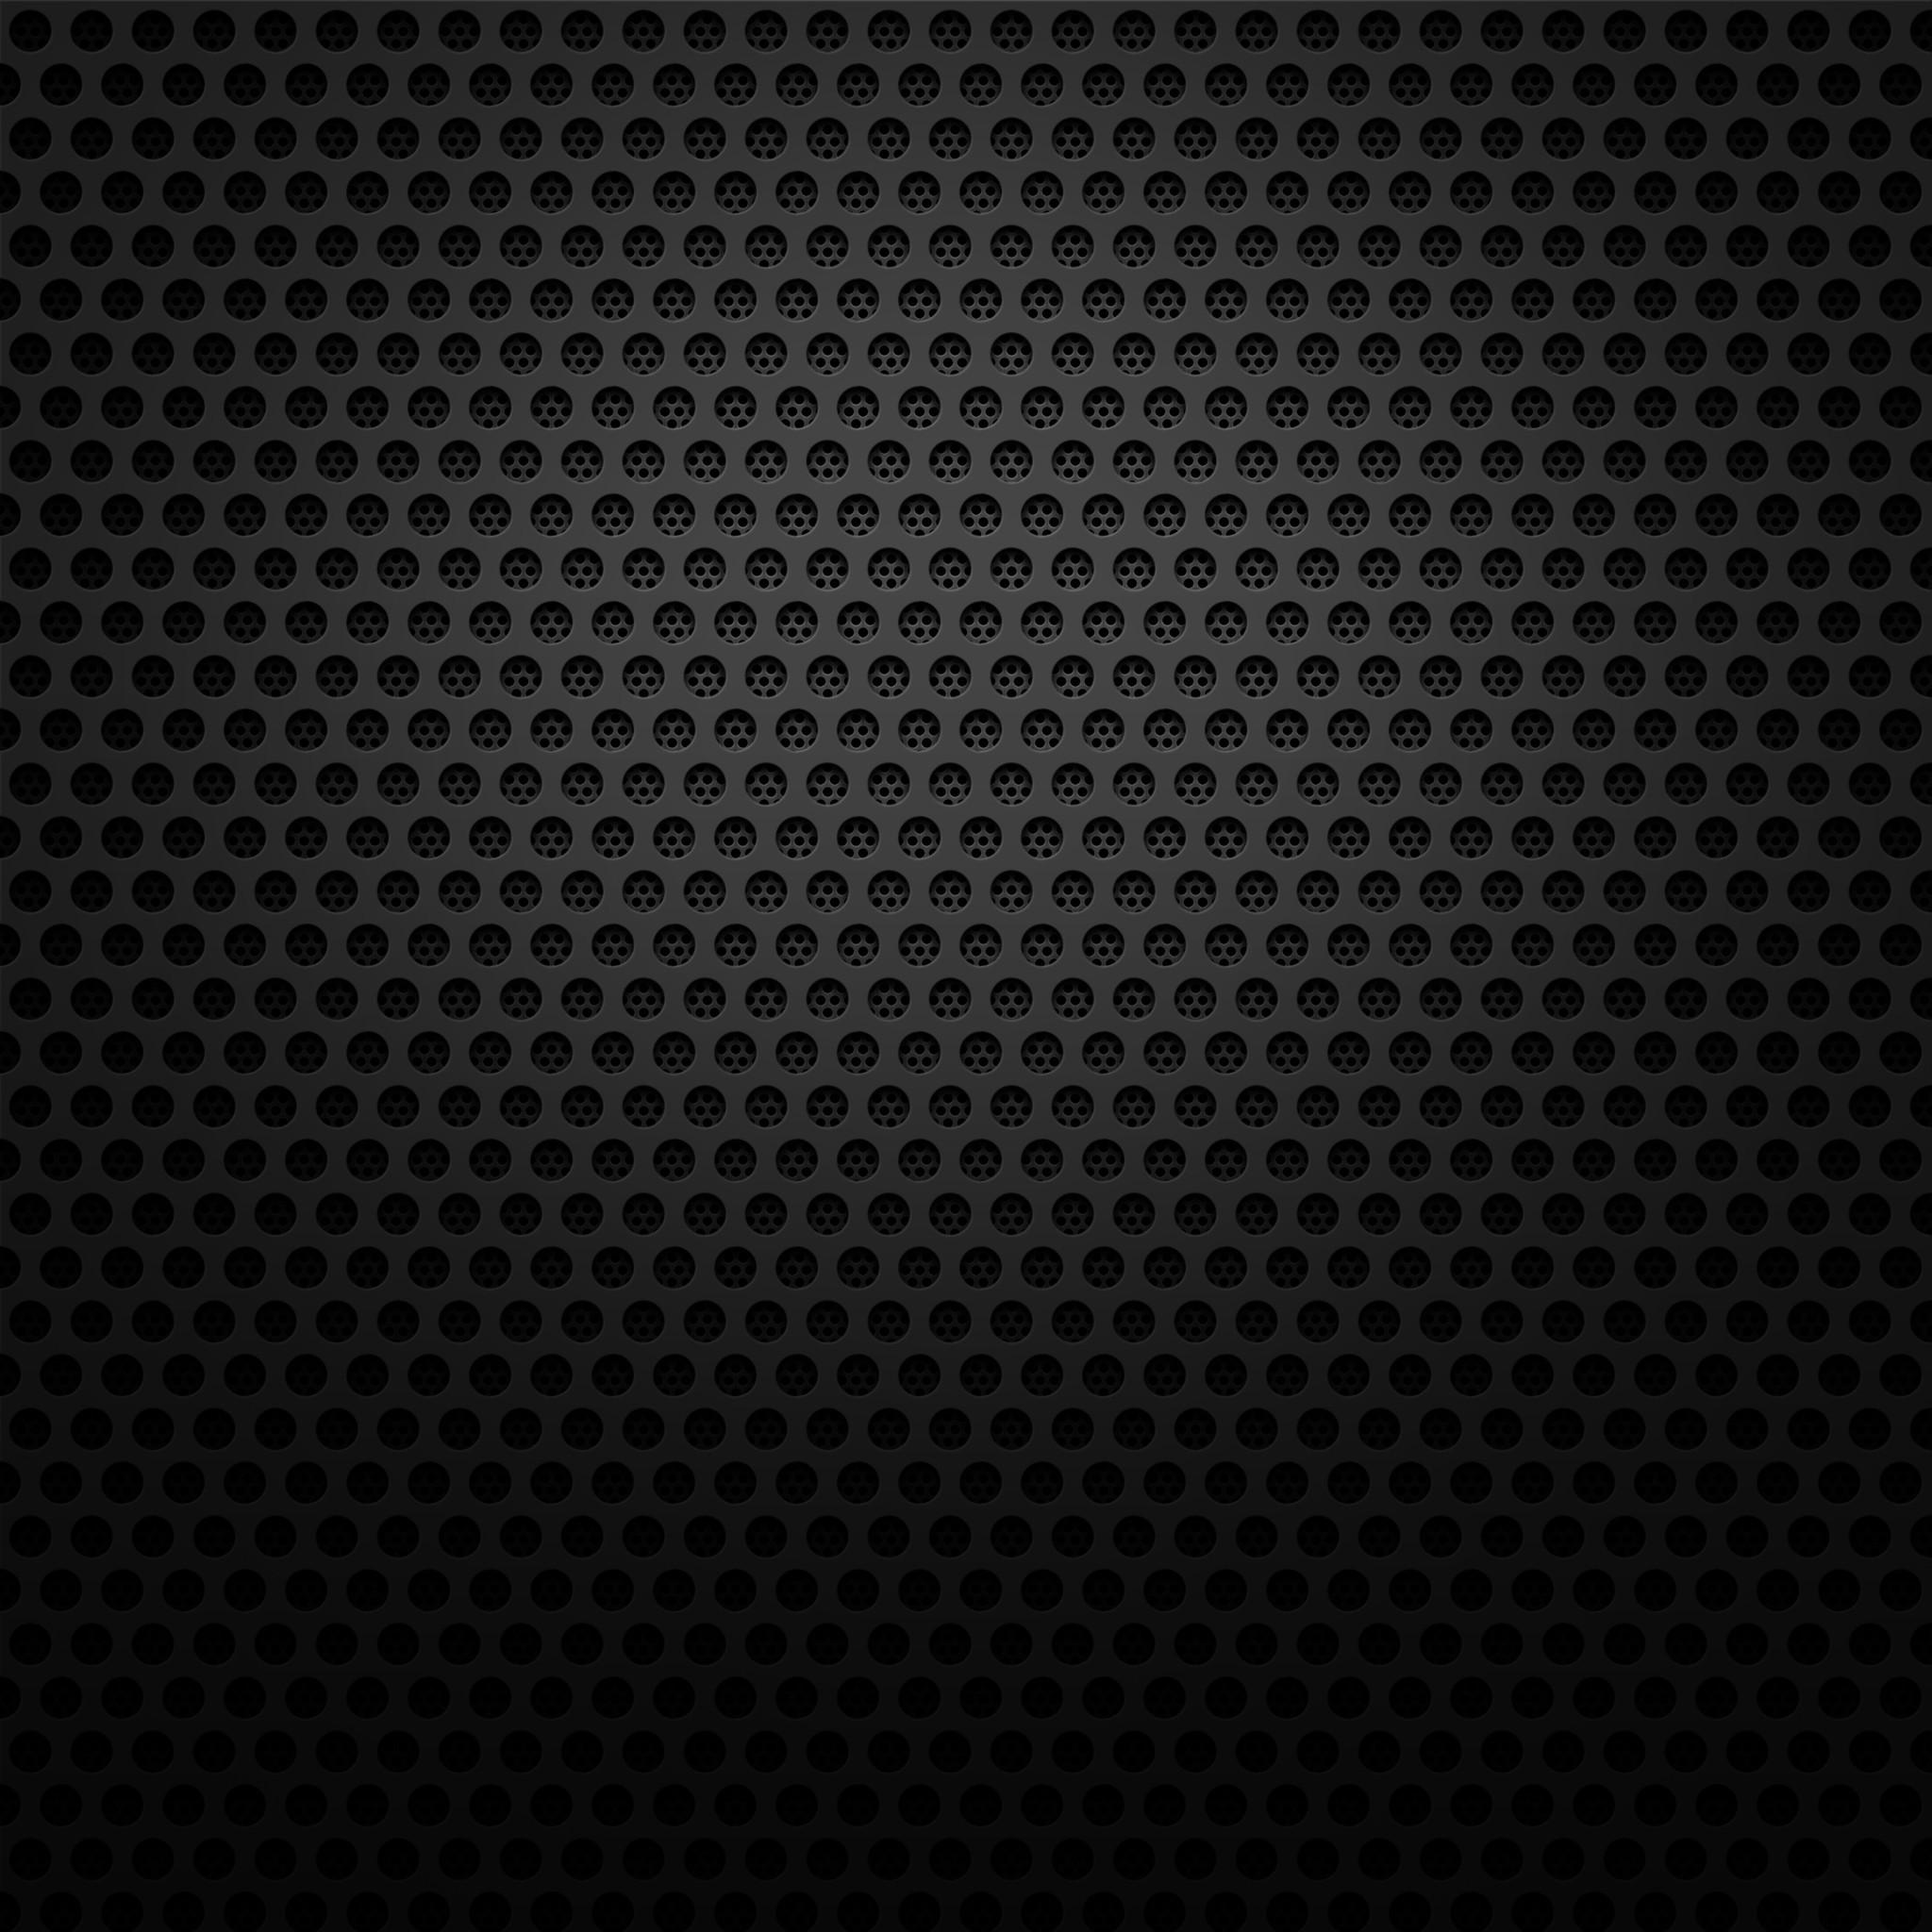 Hole iPad Air Wallpaper Download | iPhone Wallpapers, iPad wallpapers .